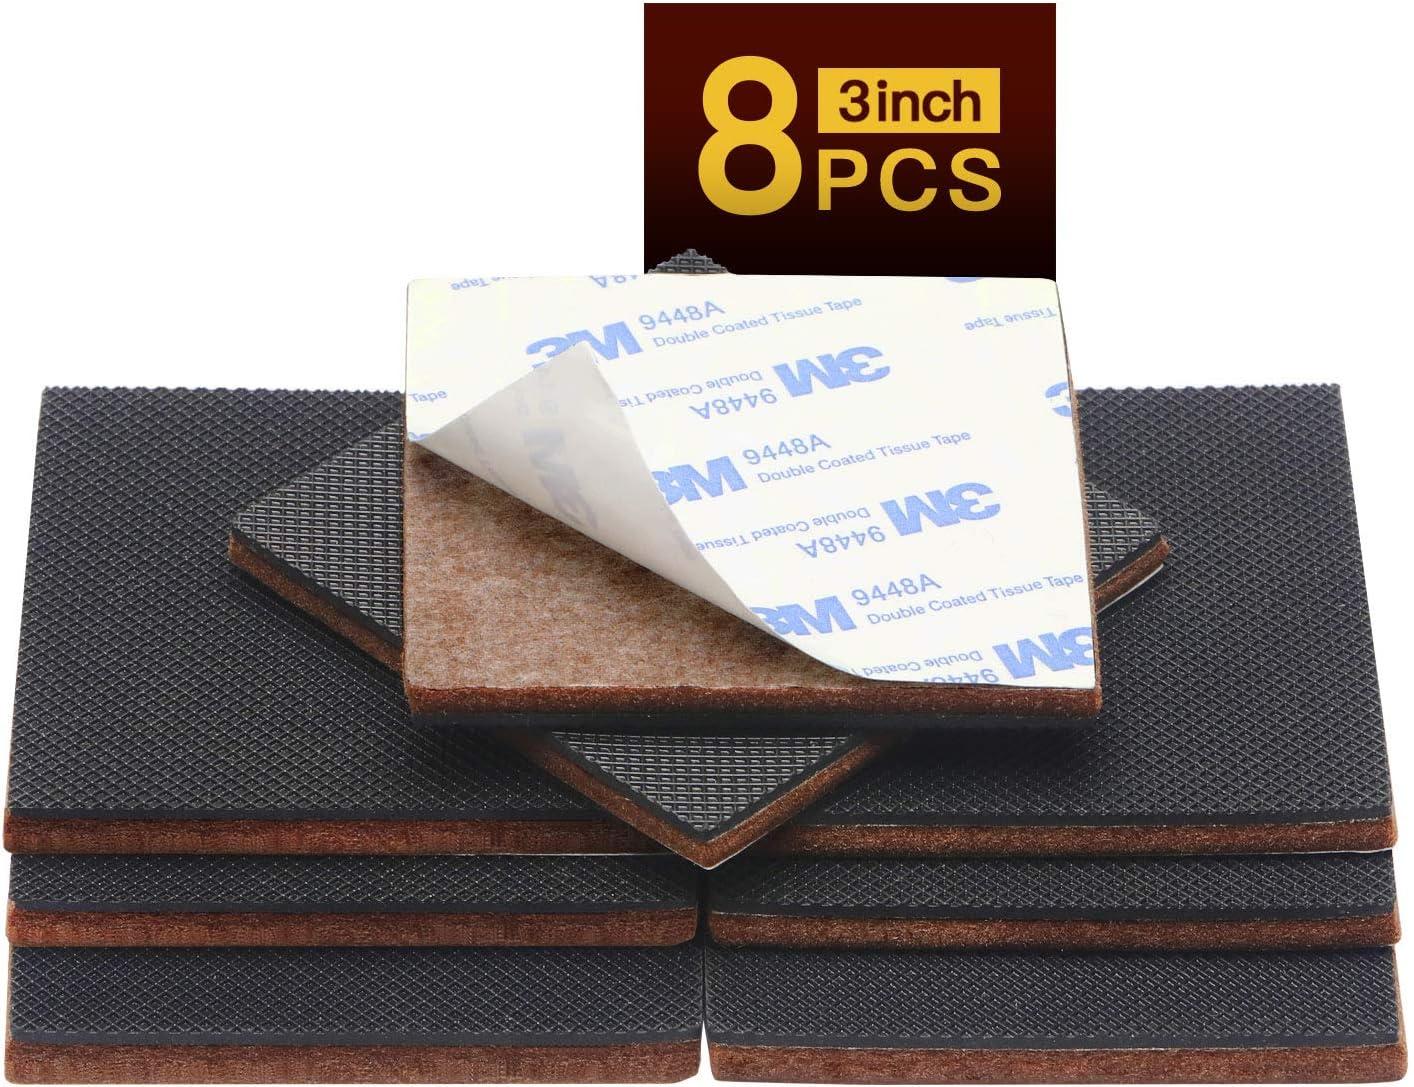 Non Slip Furniture Pads 8pcs 3inch HN STG Premium Furniture Gripper! SelfAdhesive Square Rubber Pad!Hardwood Floor Protector Sofa Anti Slip Furniture Bed